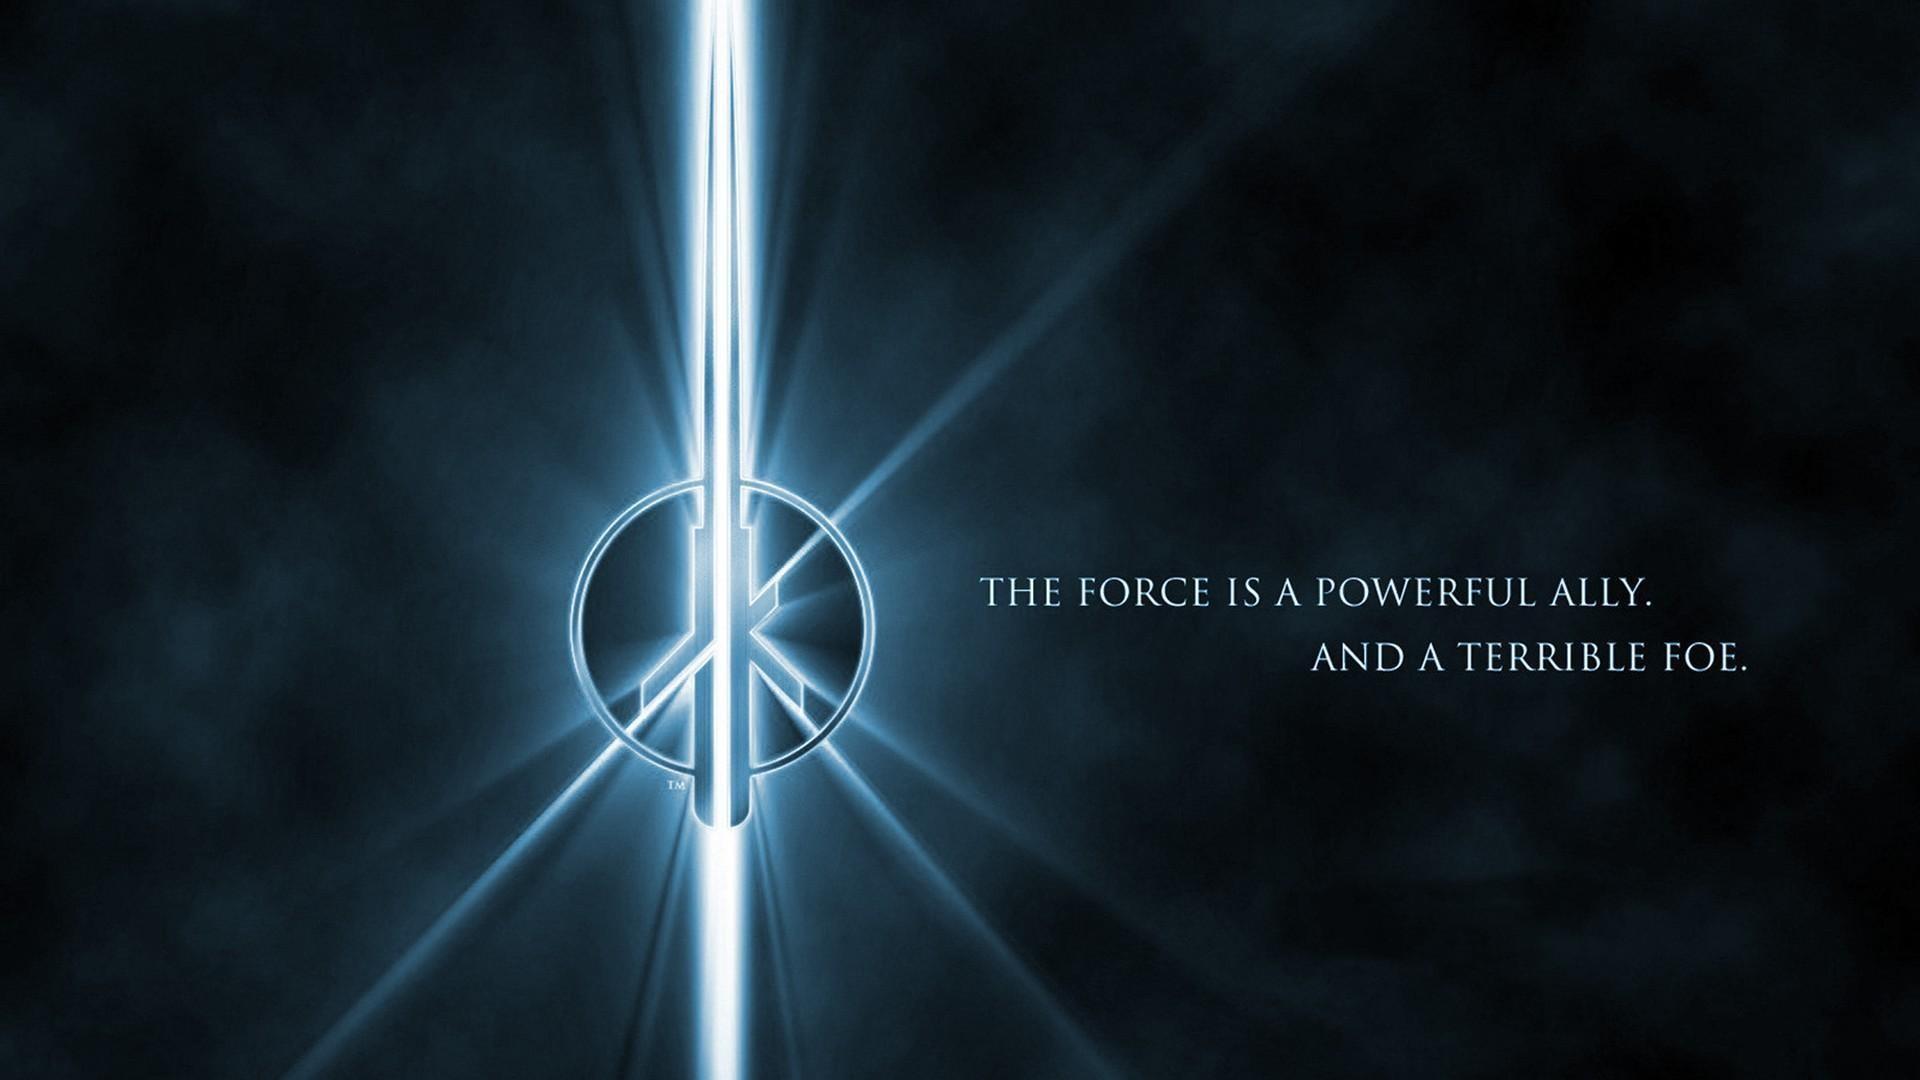 Star Wars Jedi Wallpaper Widescreen